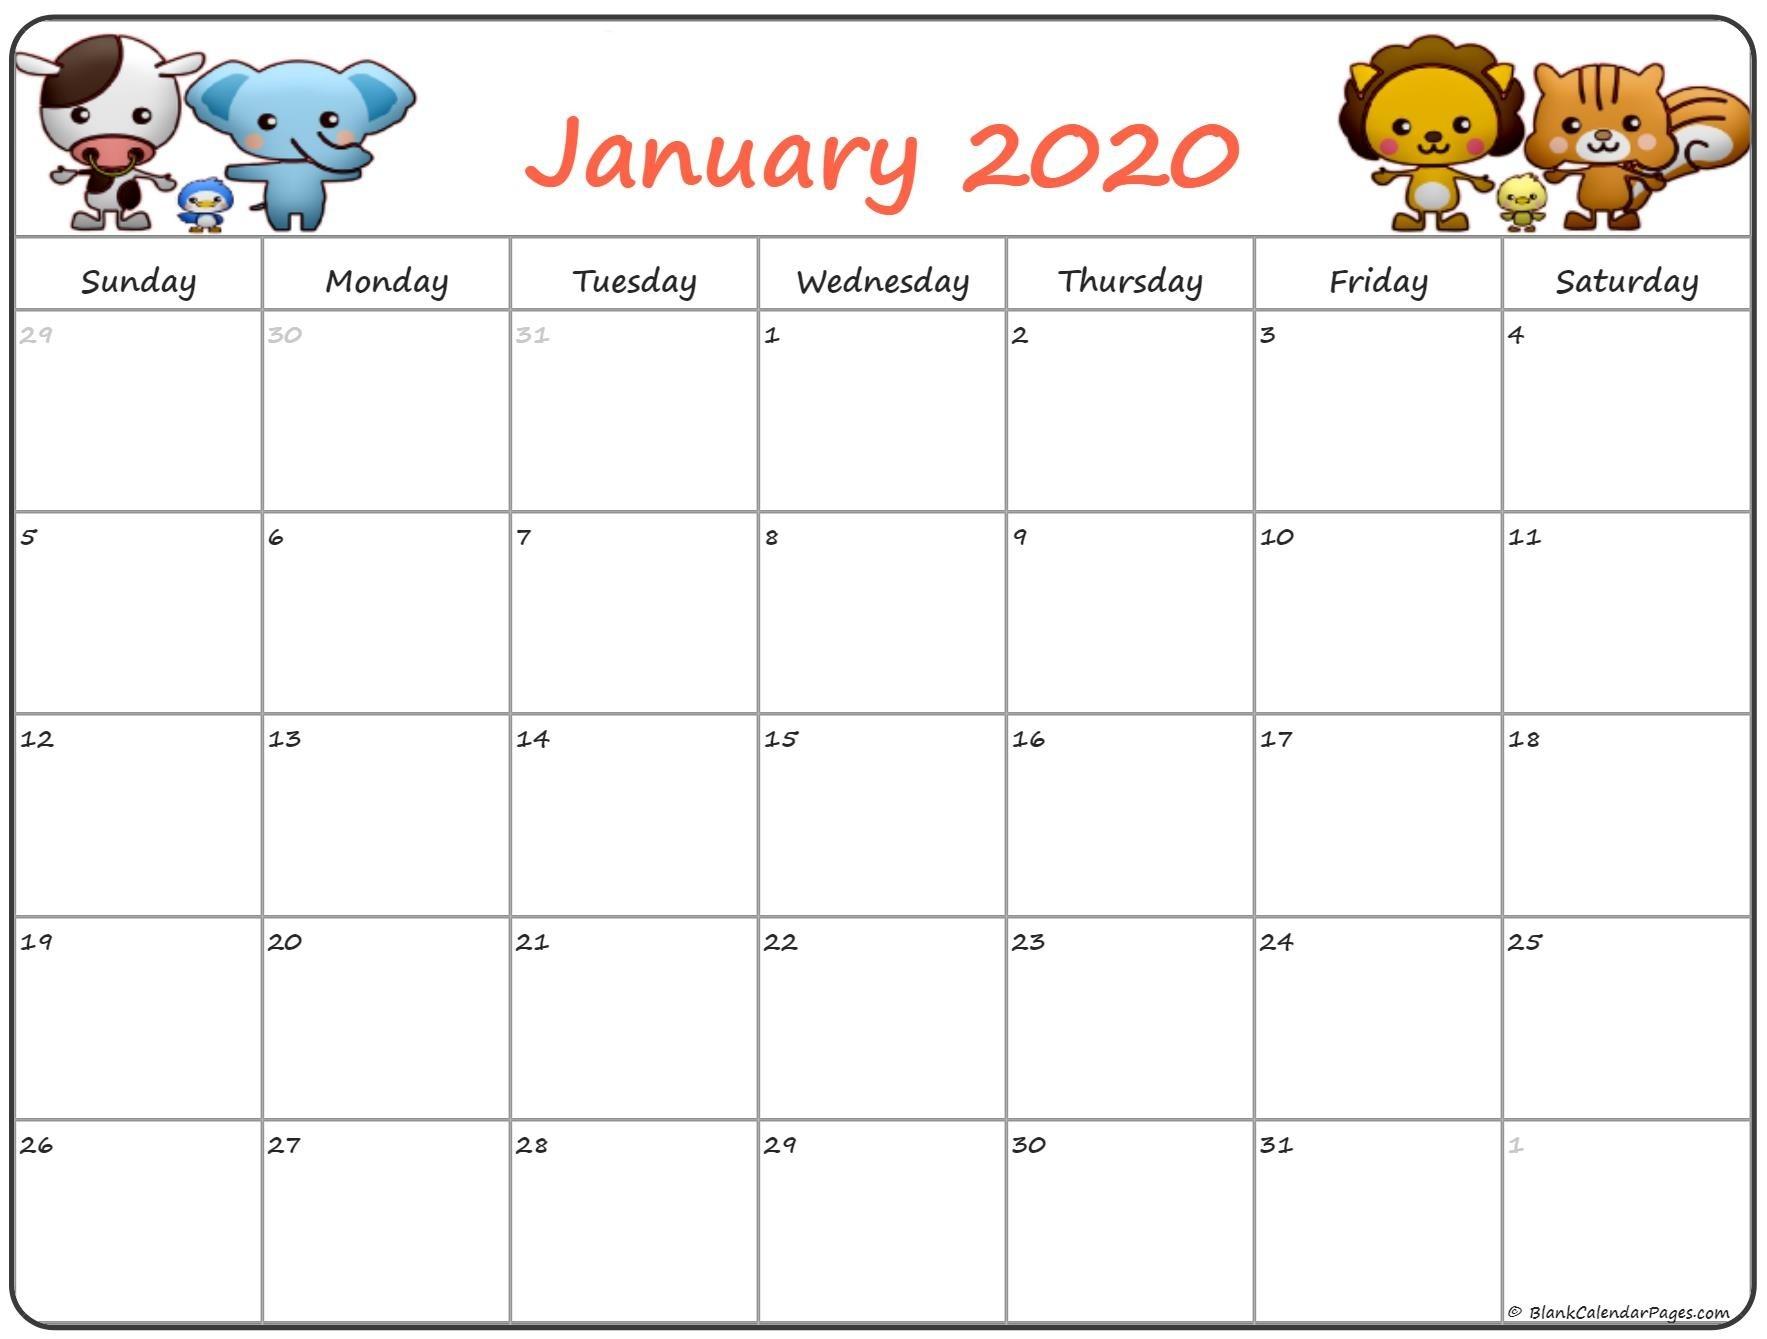 January 2020 Pregnancy Calendar | Fertility Calendar-January 2020 Calendar Cute